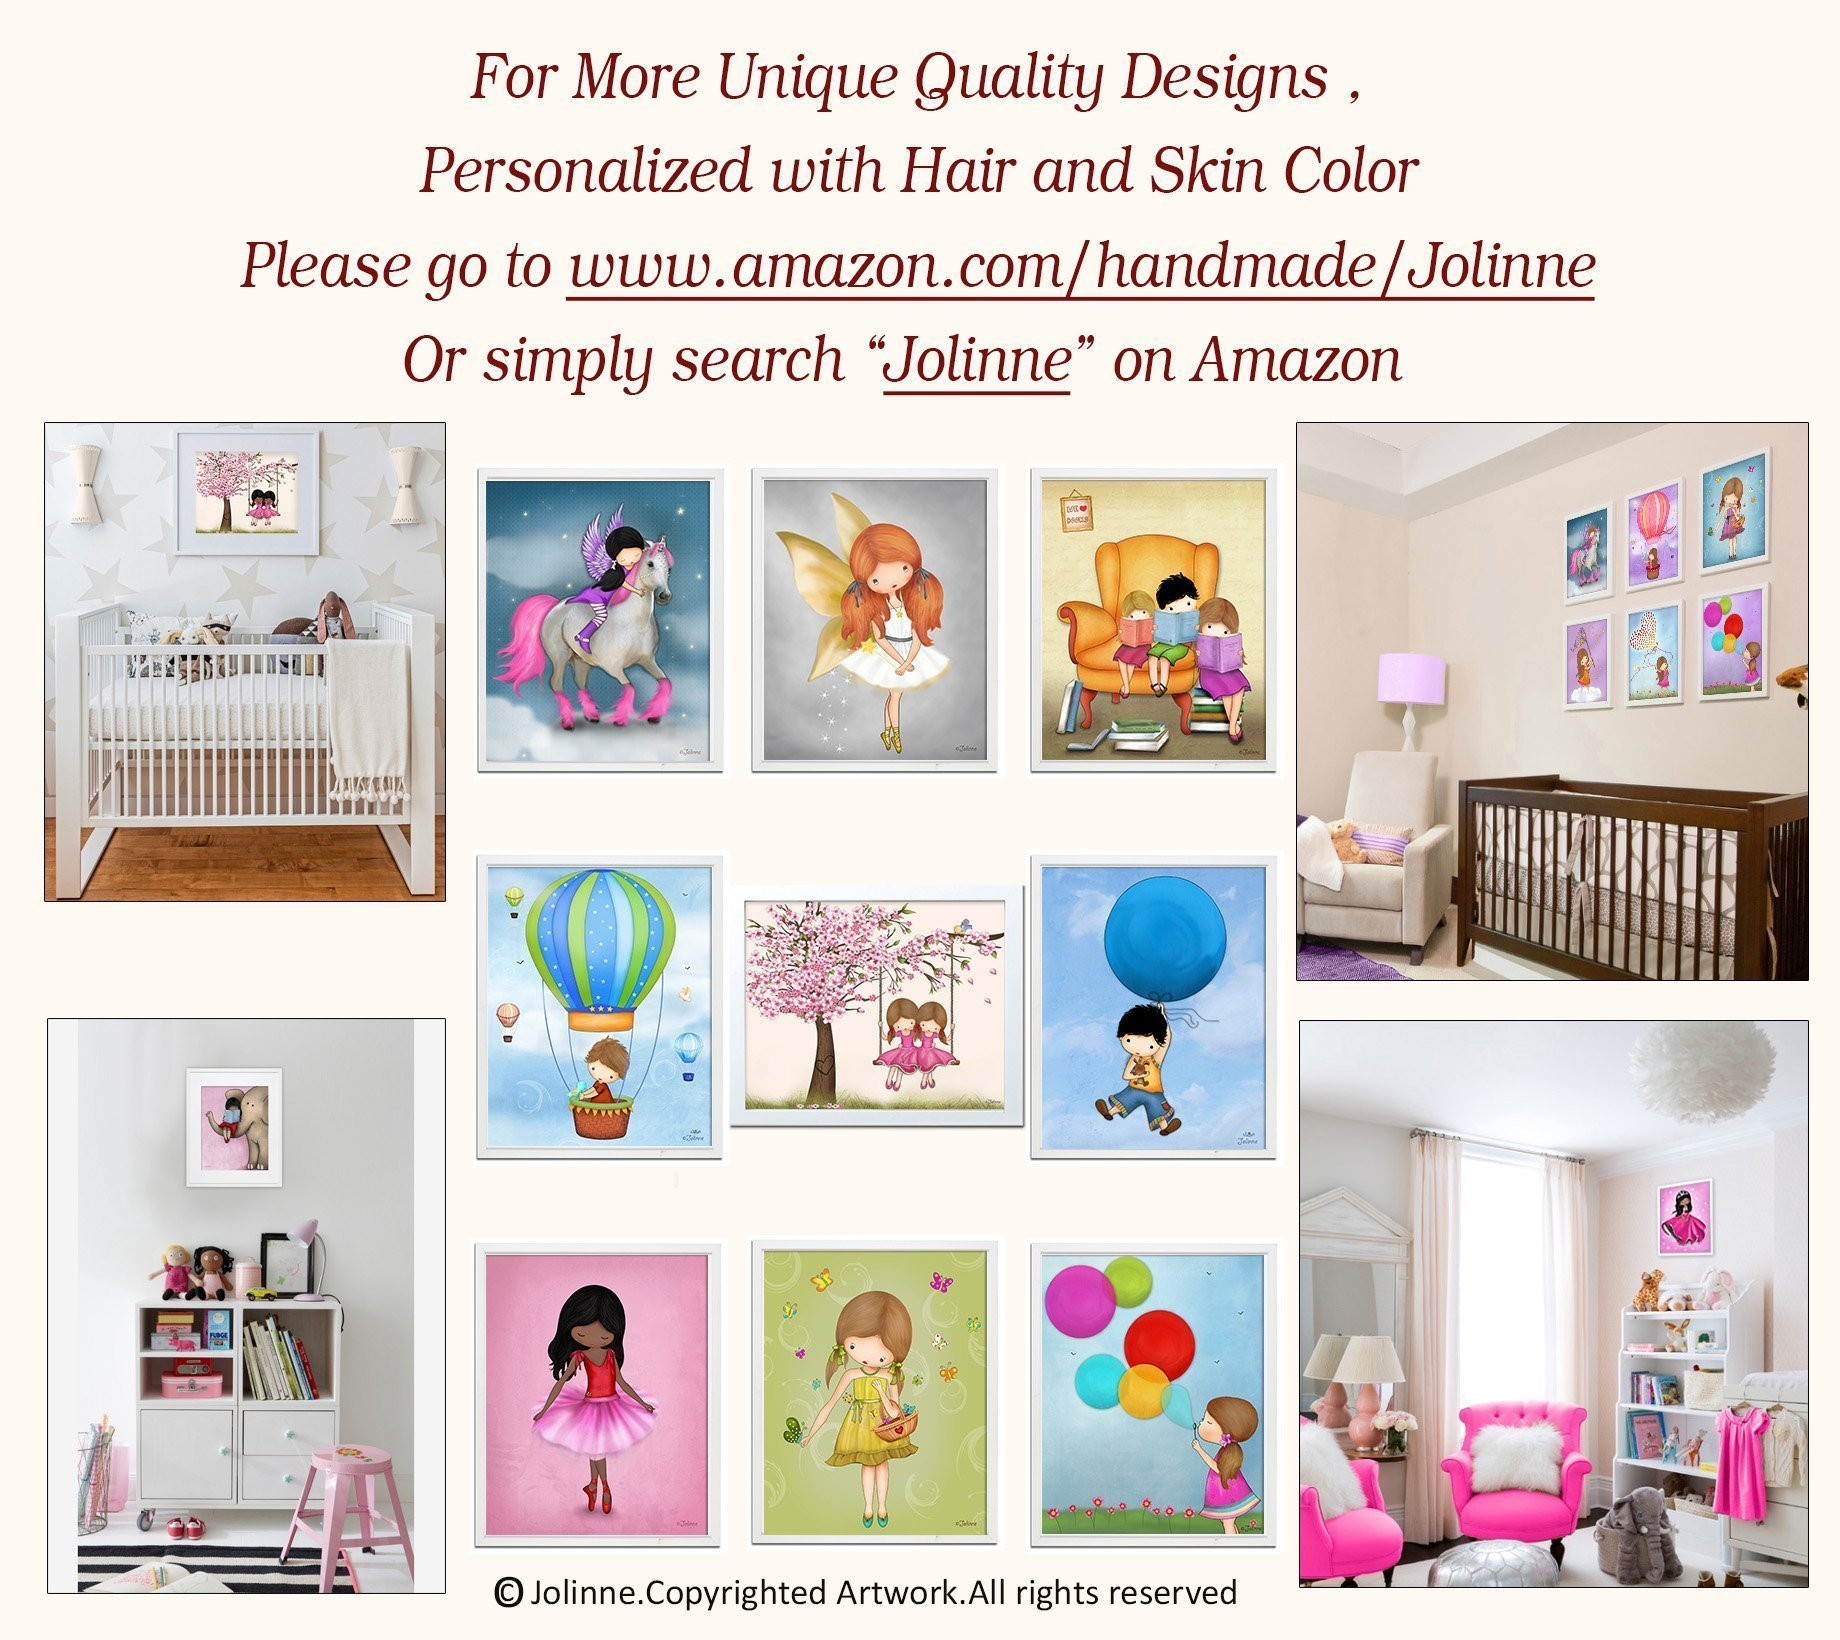 Pictures for Girls Bedroom Art Prints Nursery Illustrations Children's Room Decor 8x10/11x14 Set of 4 Custom Hair and Skin Color